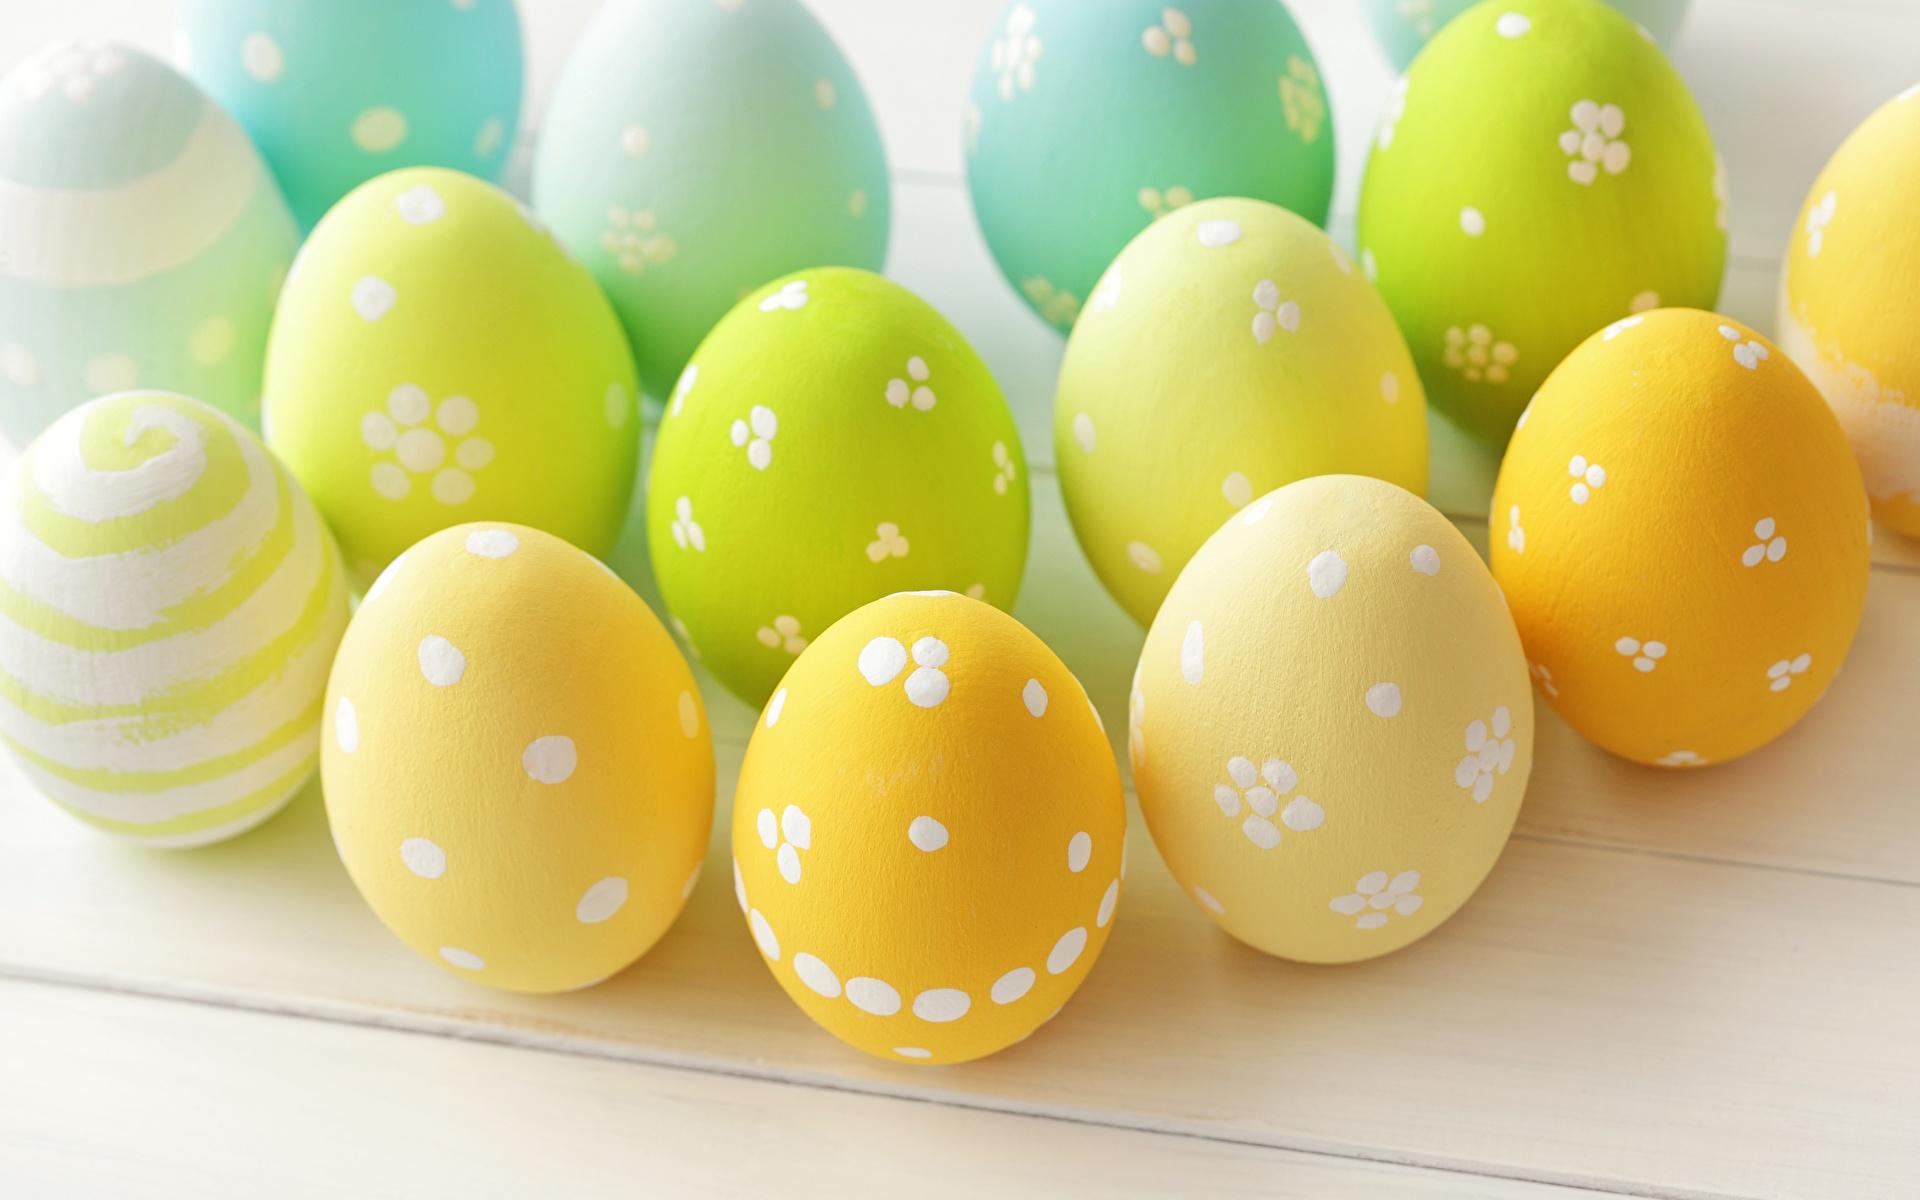 Картинка Пасха Яйца 1920x1200 яиц яйцо яйцами